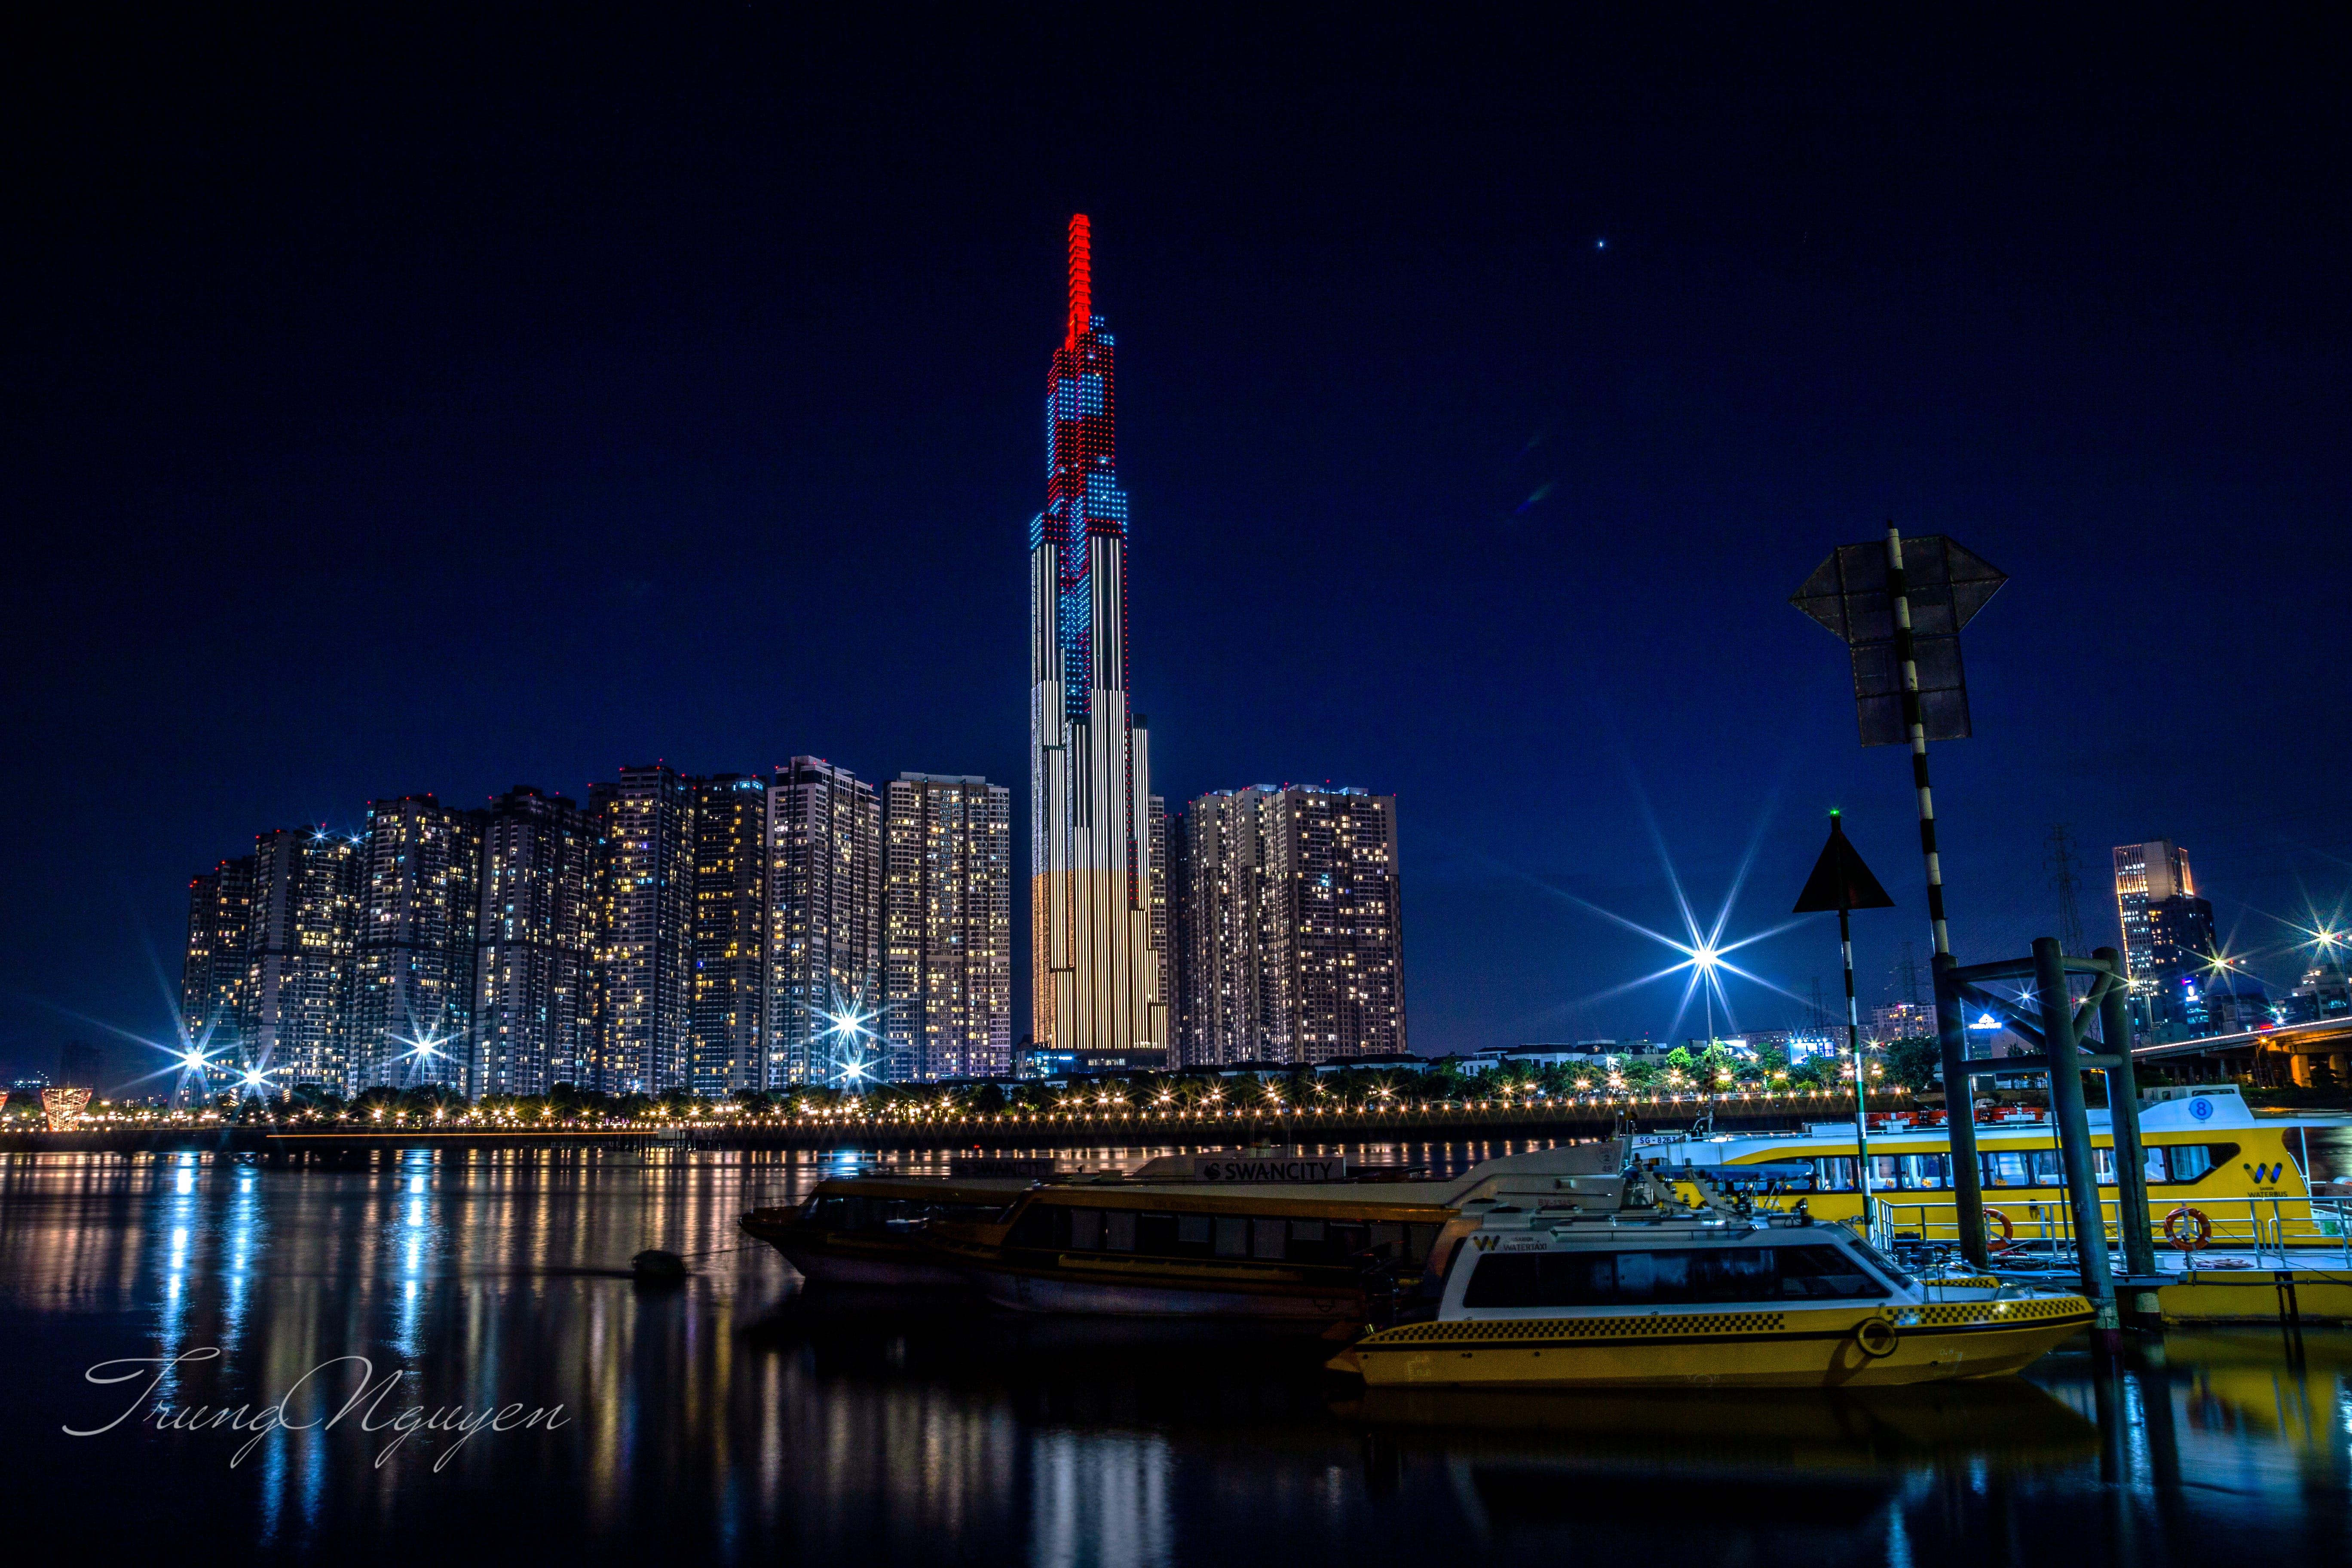 Free stock photo of Citylandscape